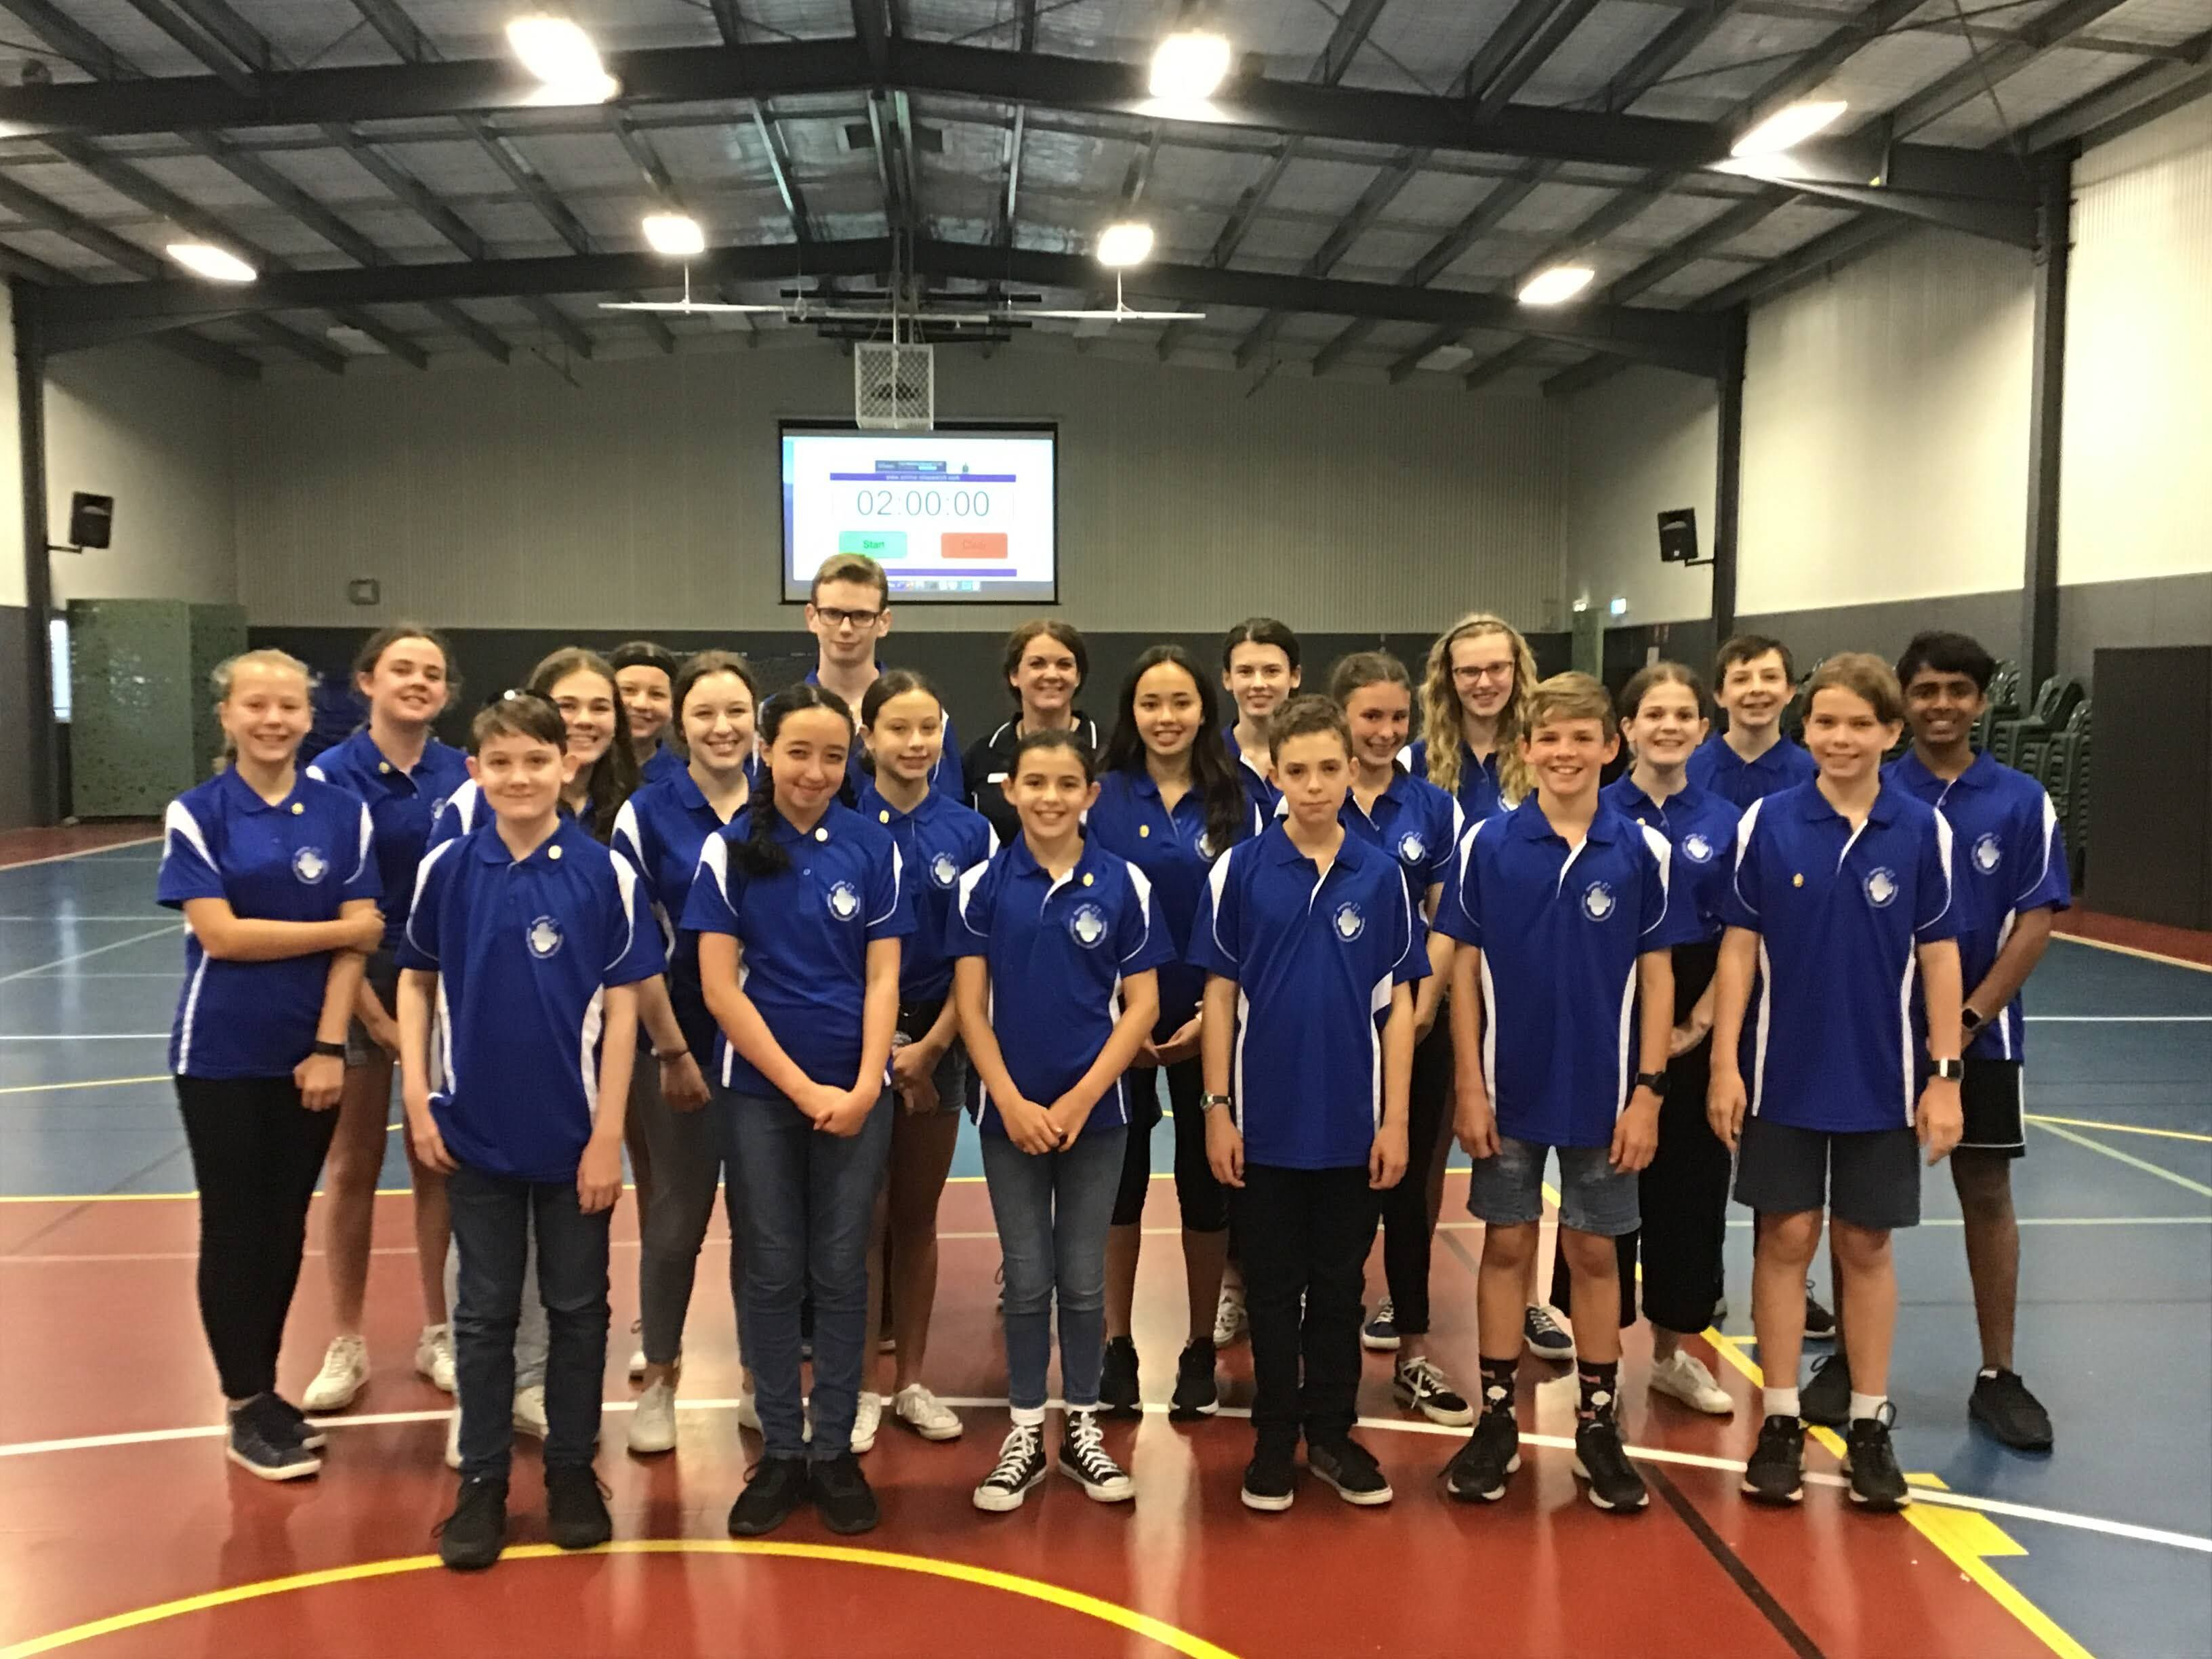 Illawarra Christian School 5